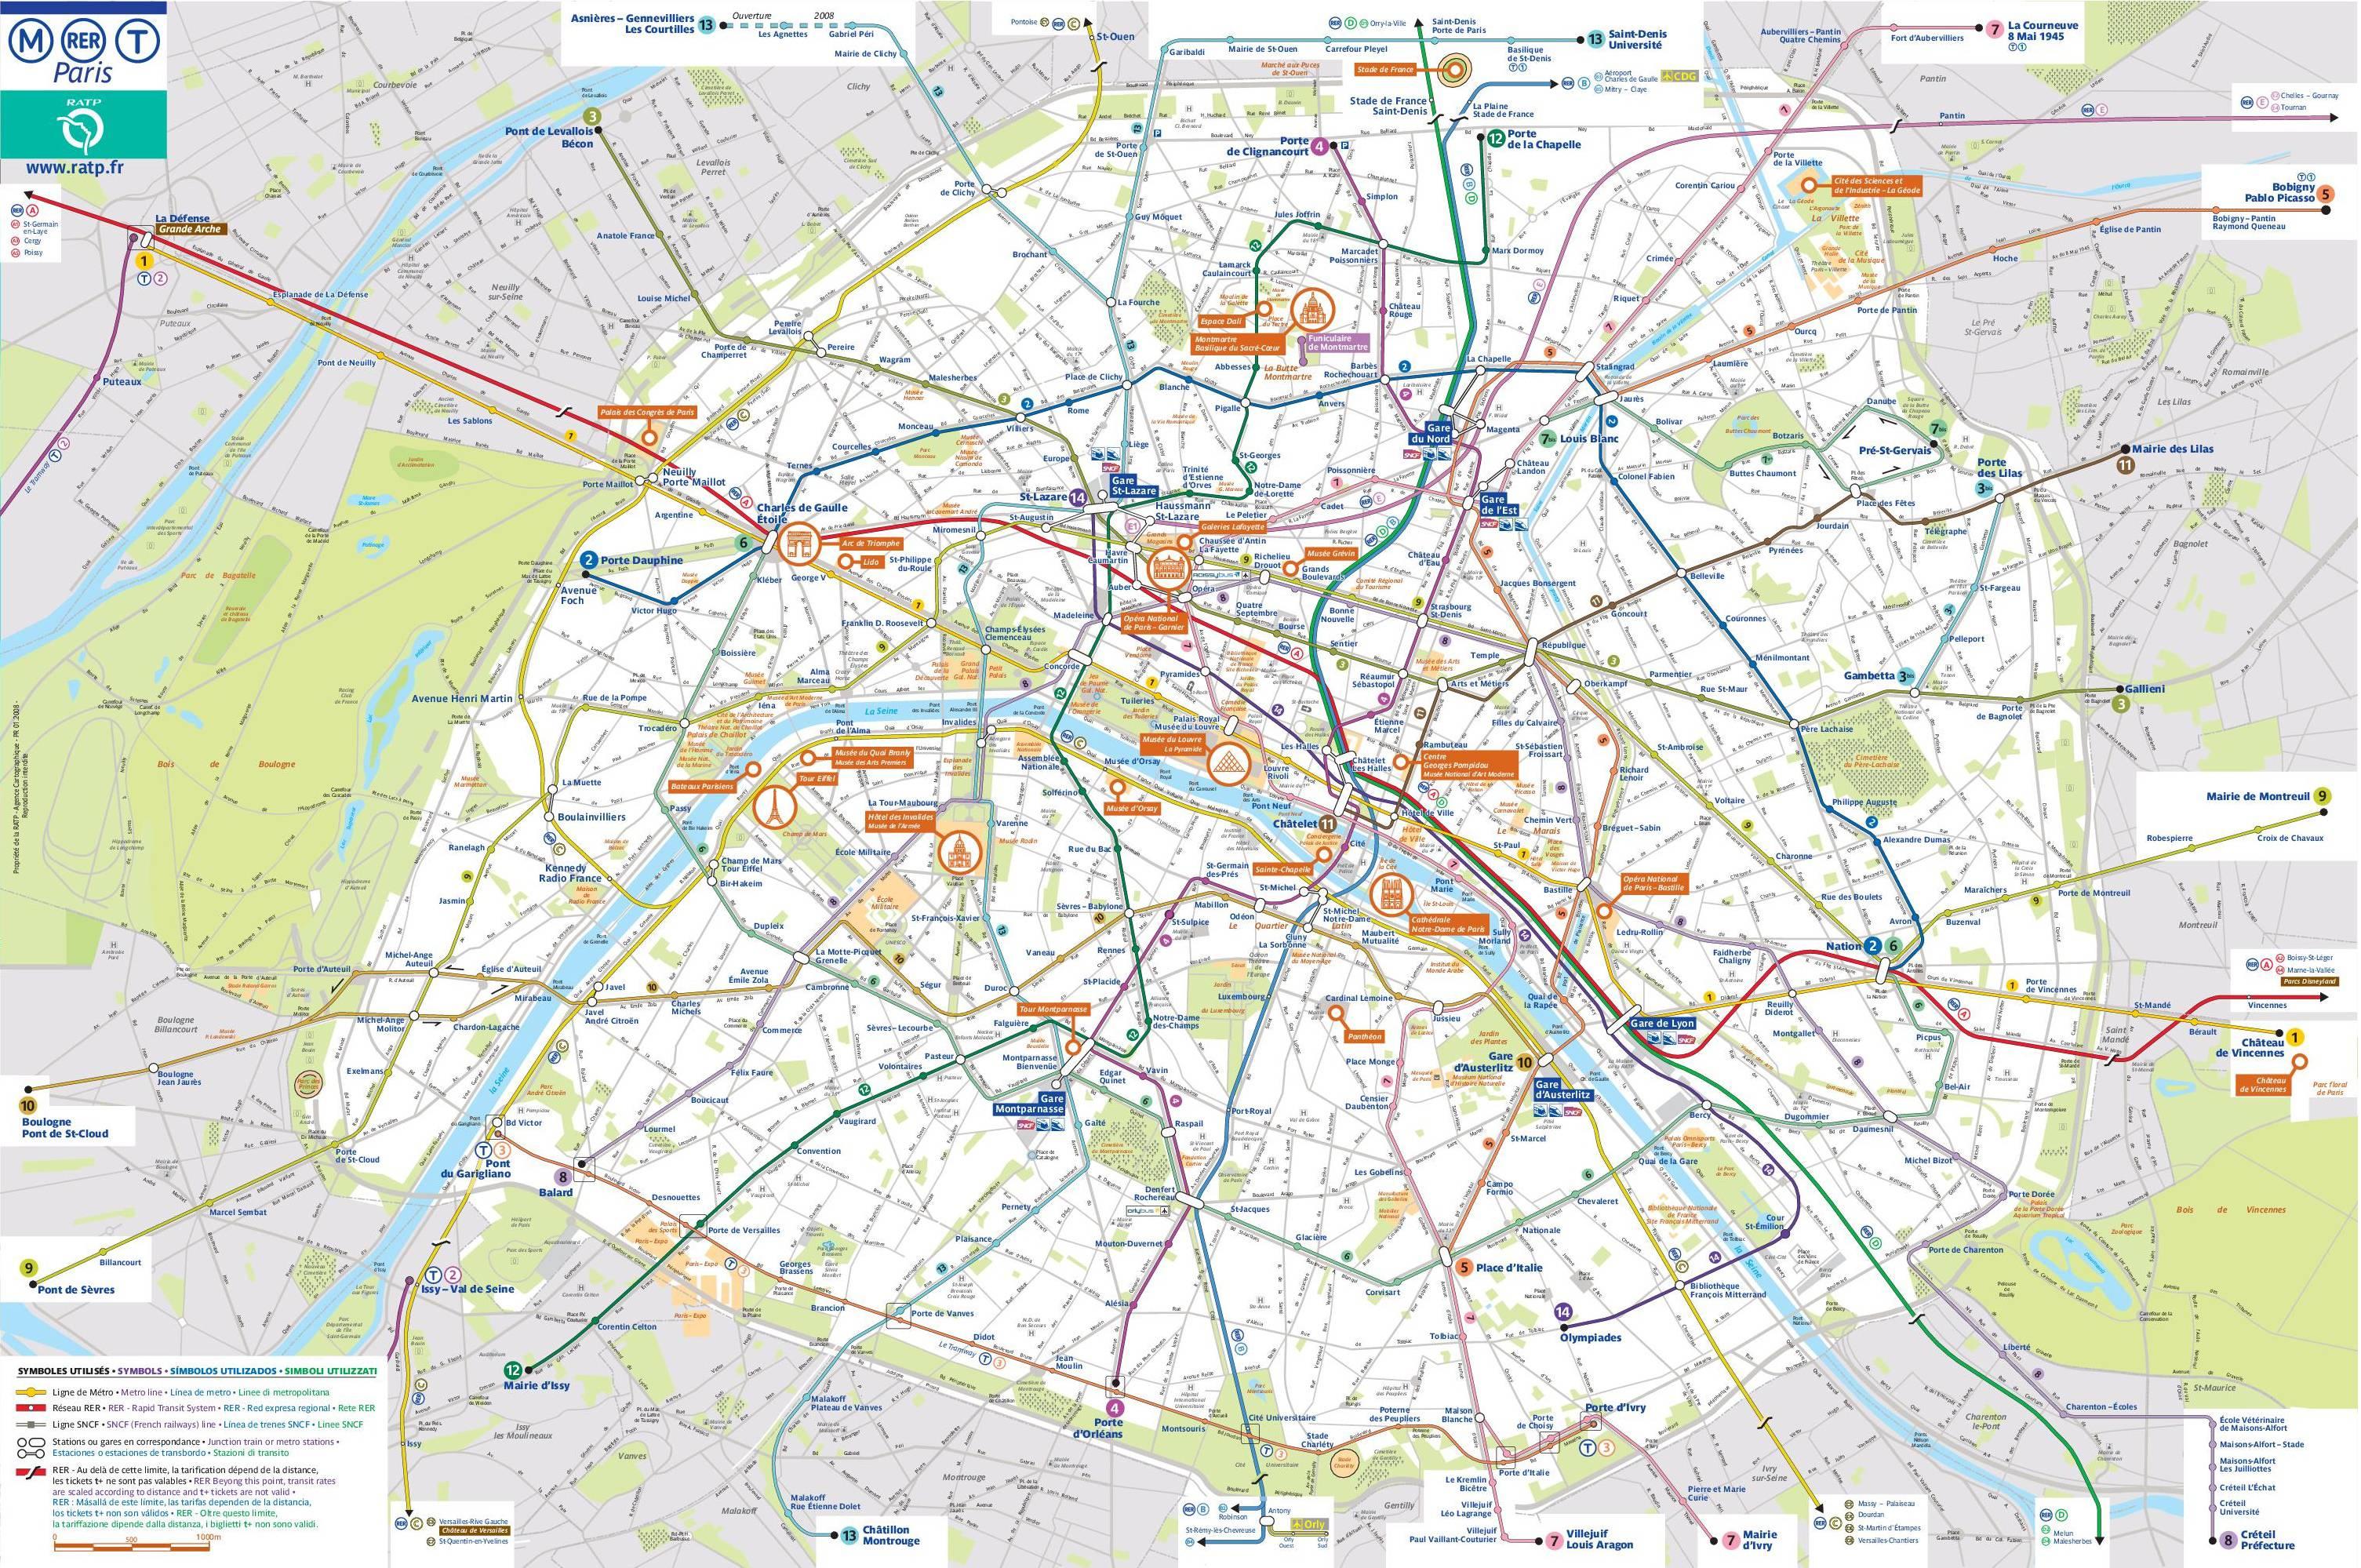 carte-de-paris-transports.jpg